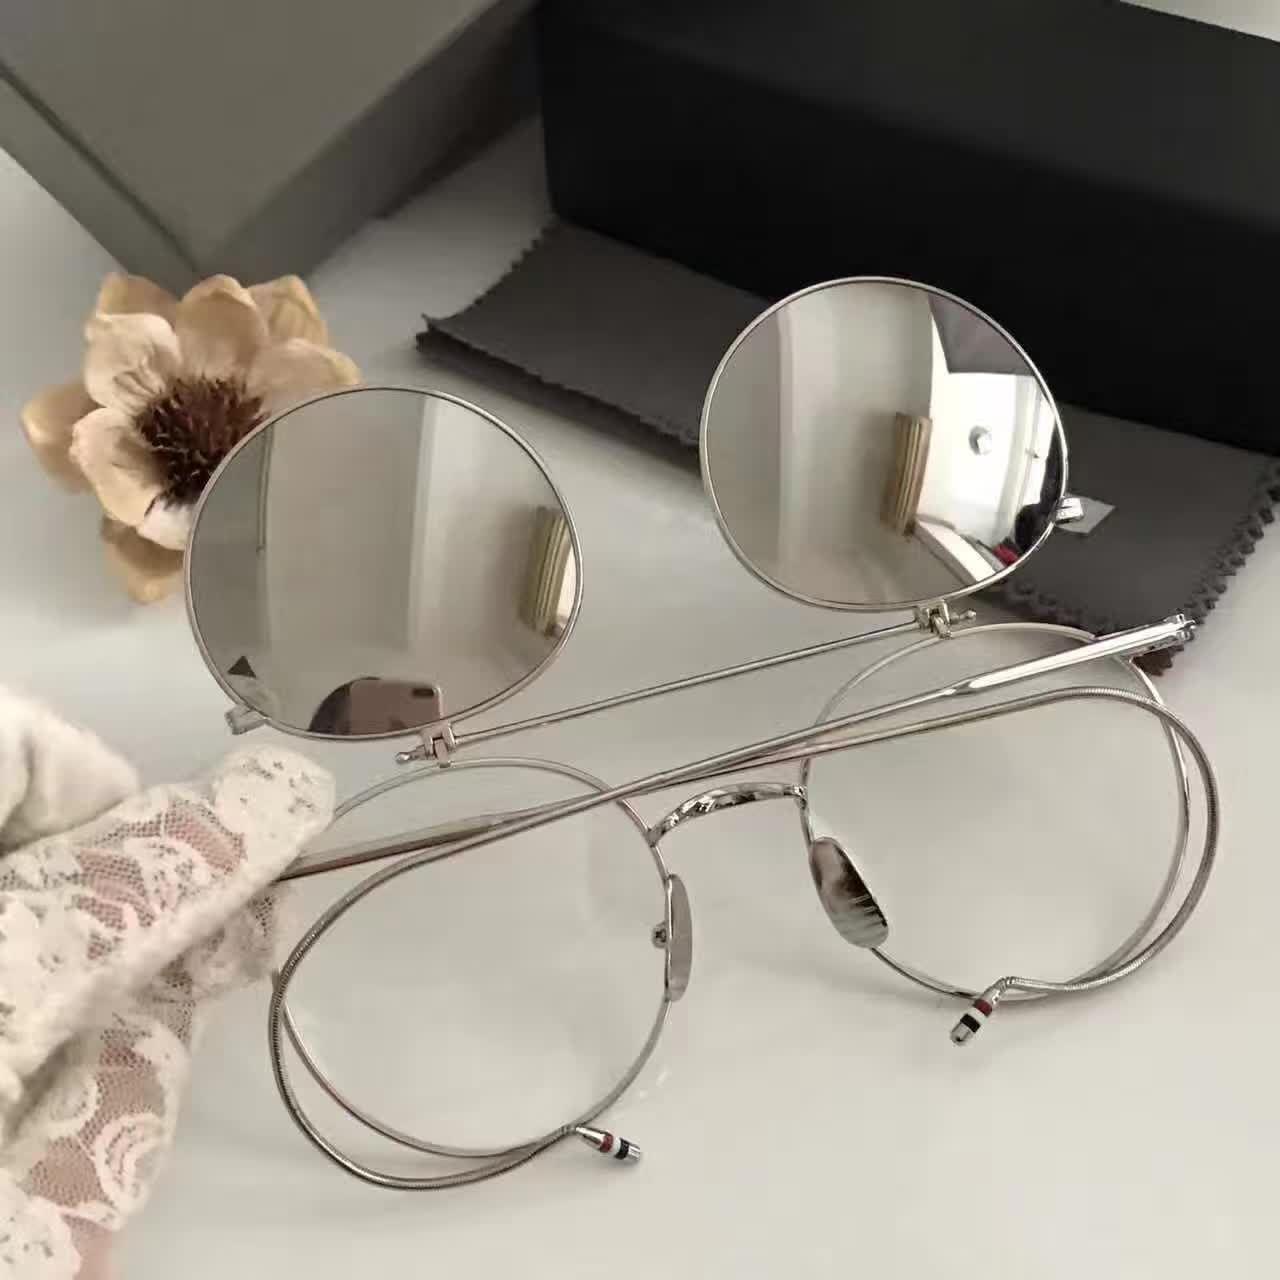 36607ac4865 2017 Men Browne Vintage Flip Up Silver Eyeglasses Sunglasses Frames Brand  New In Box Smith Sunglasses Sunglasses At Night From Baiyu168